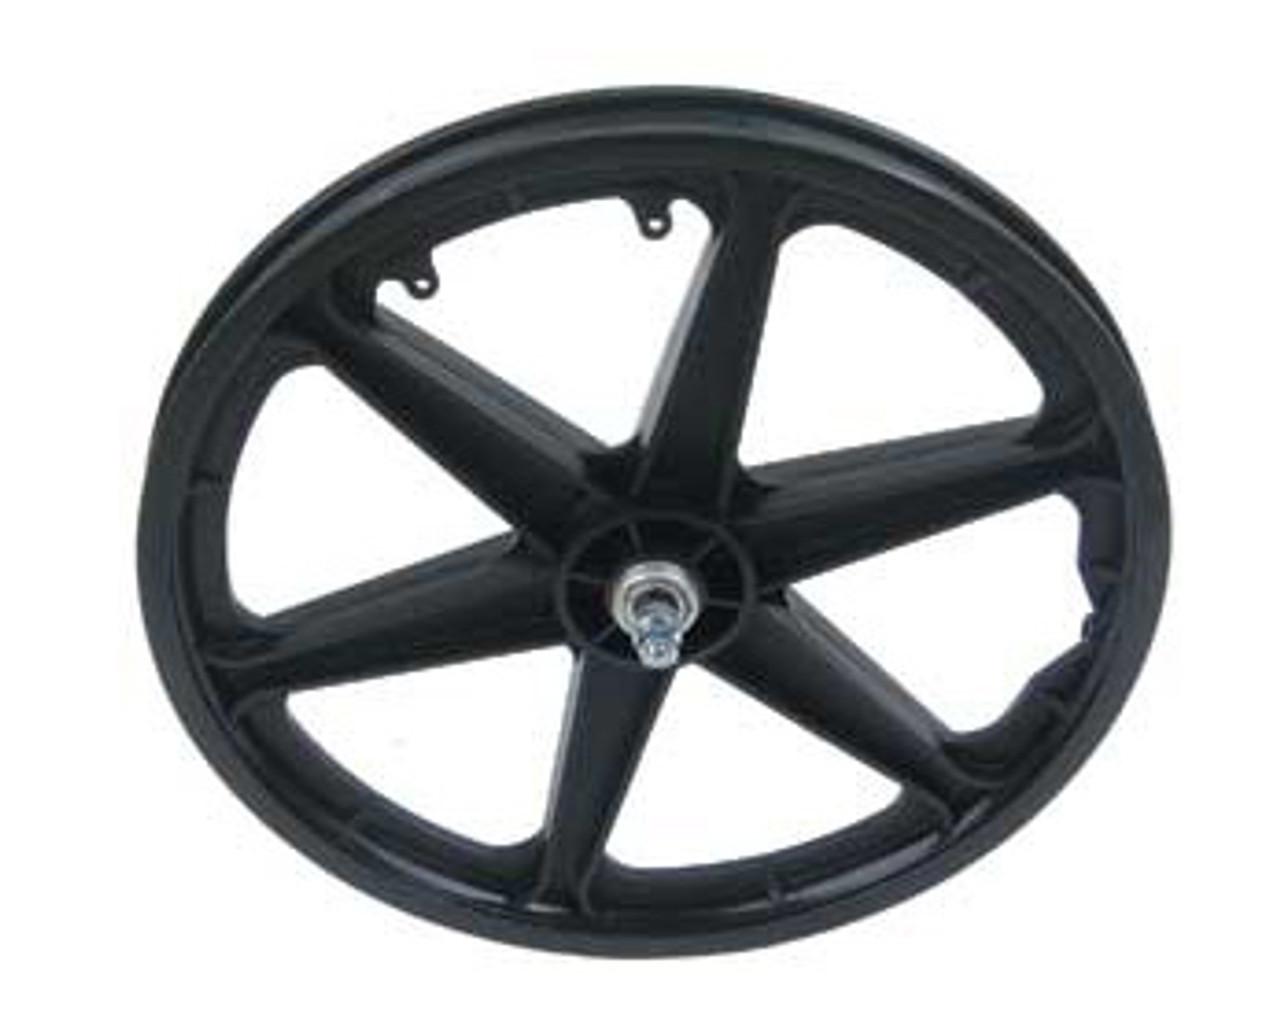 Bmx 20 Black Plastic 6 Spoke Front Wheels 20 X 1 75